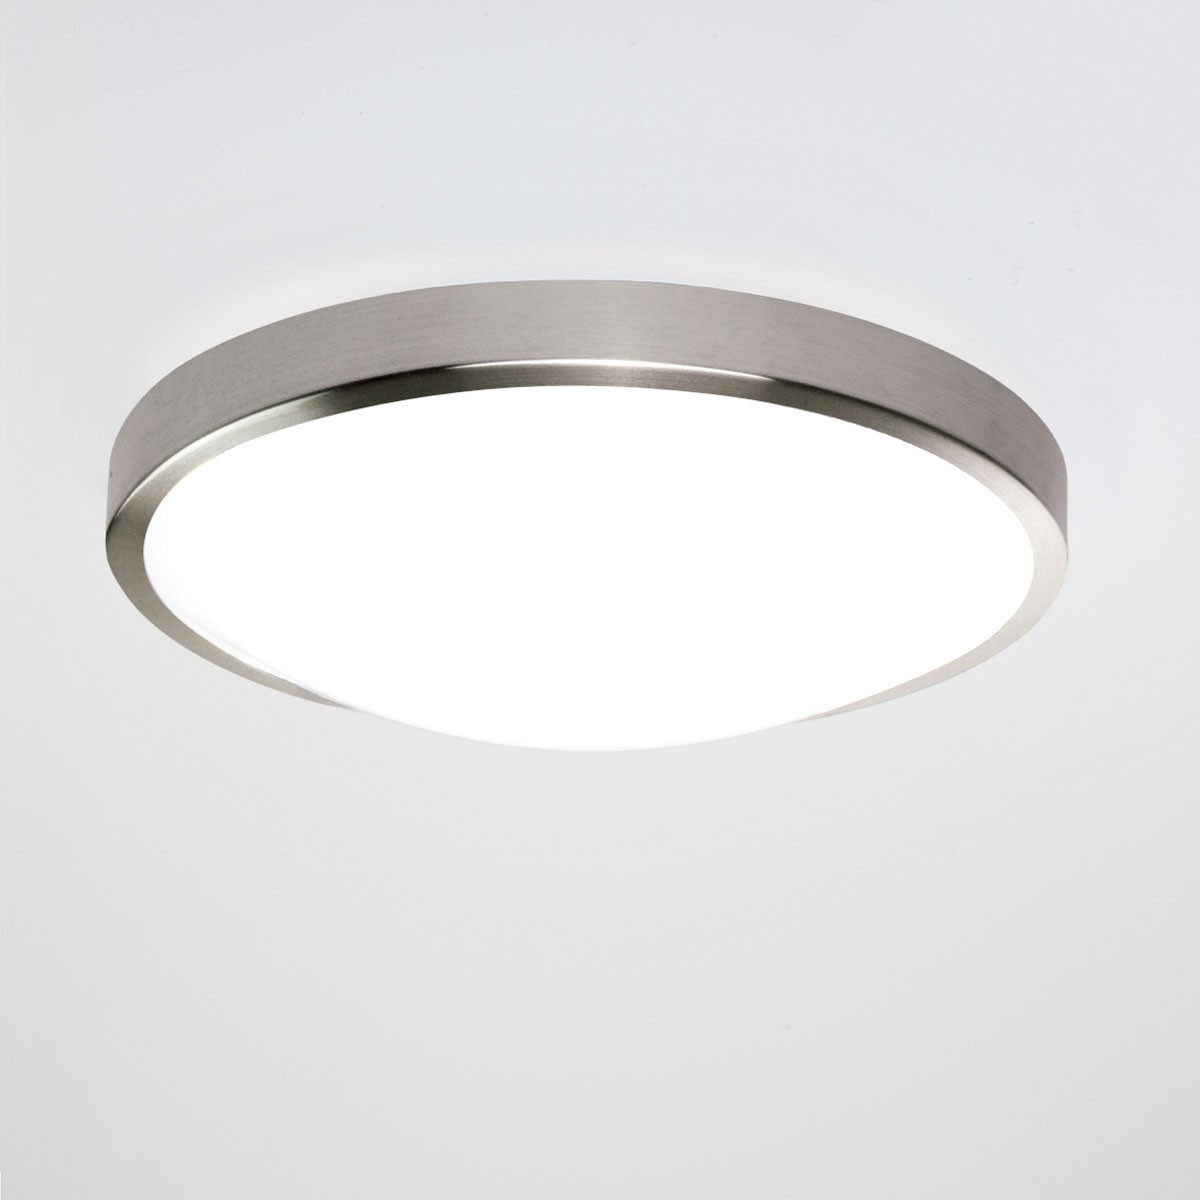 Led Ceiling Lights With Sensor: Astro Osaka Sensor Brushed Nickel LED Ceiling Light With